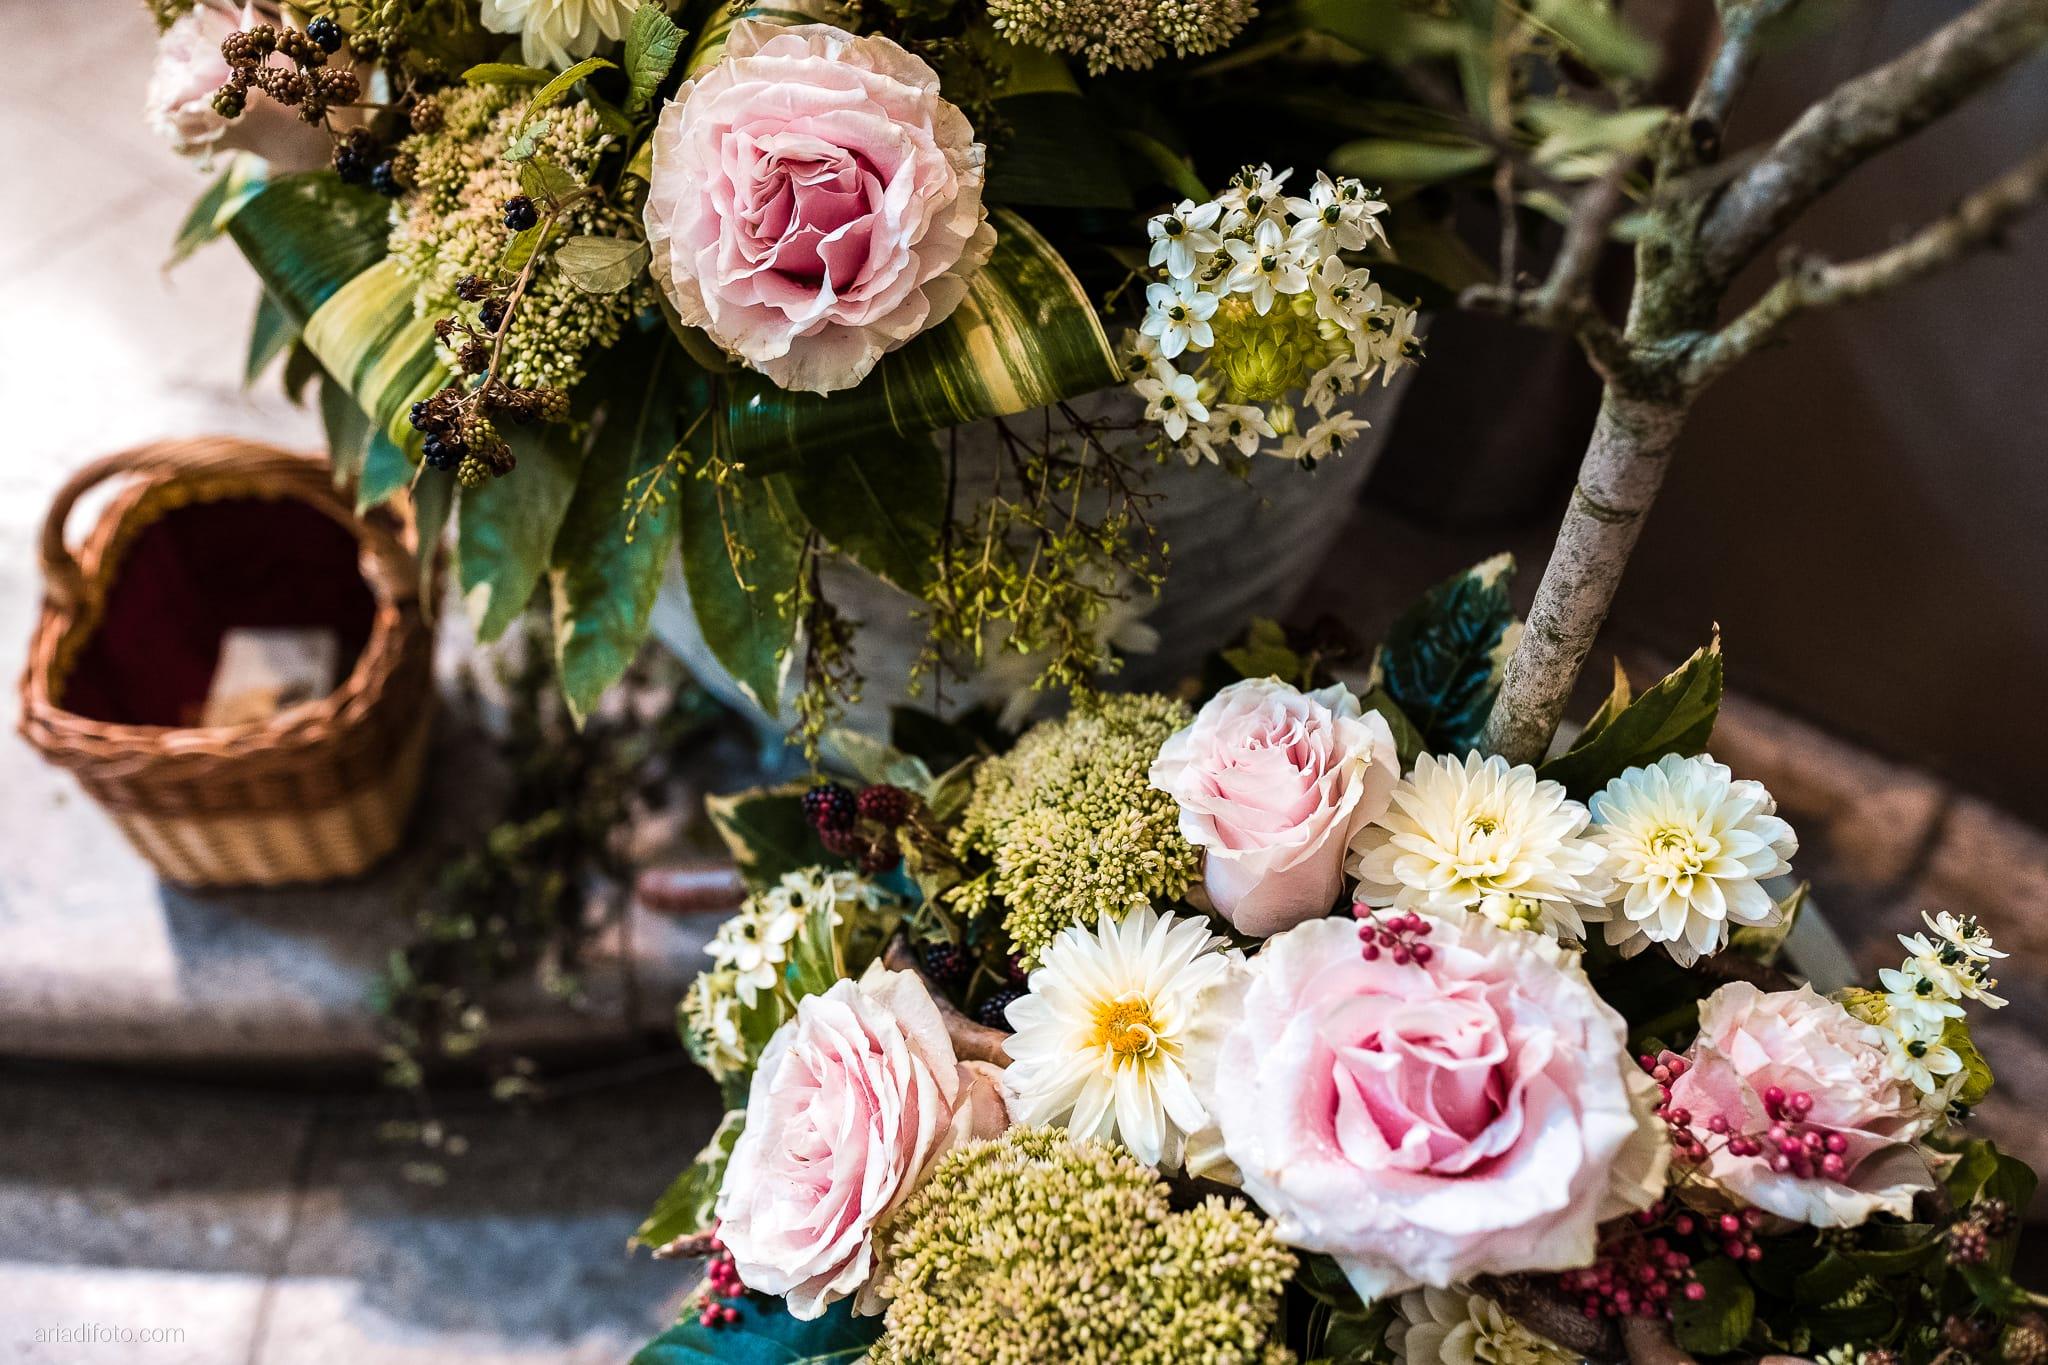 Stefania Raffaele Matrimonio Country Chic Outdoor Gorizia cerimonia dettagli fiori